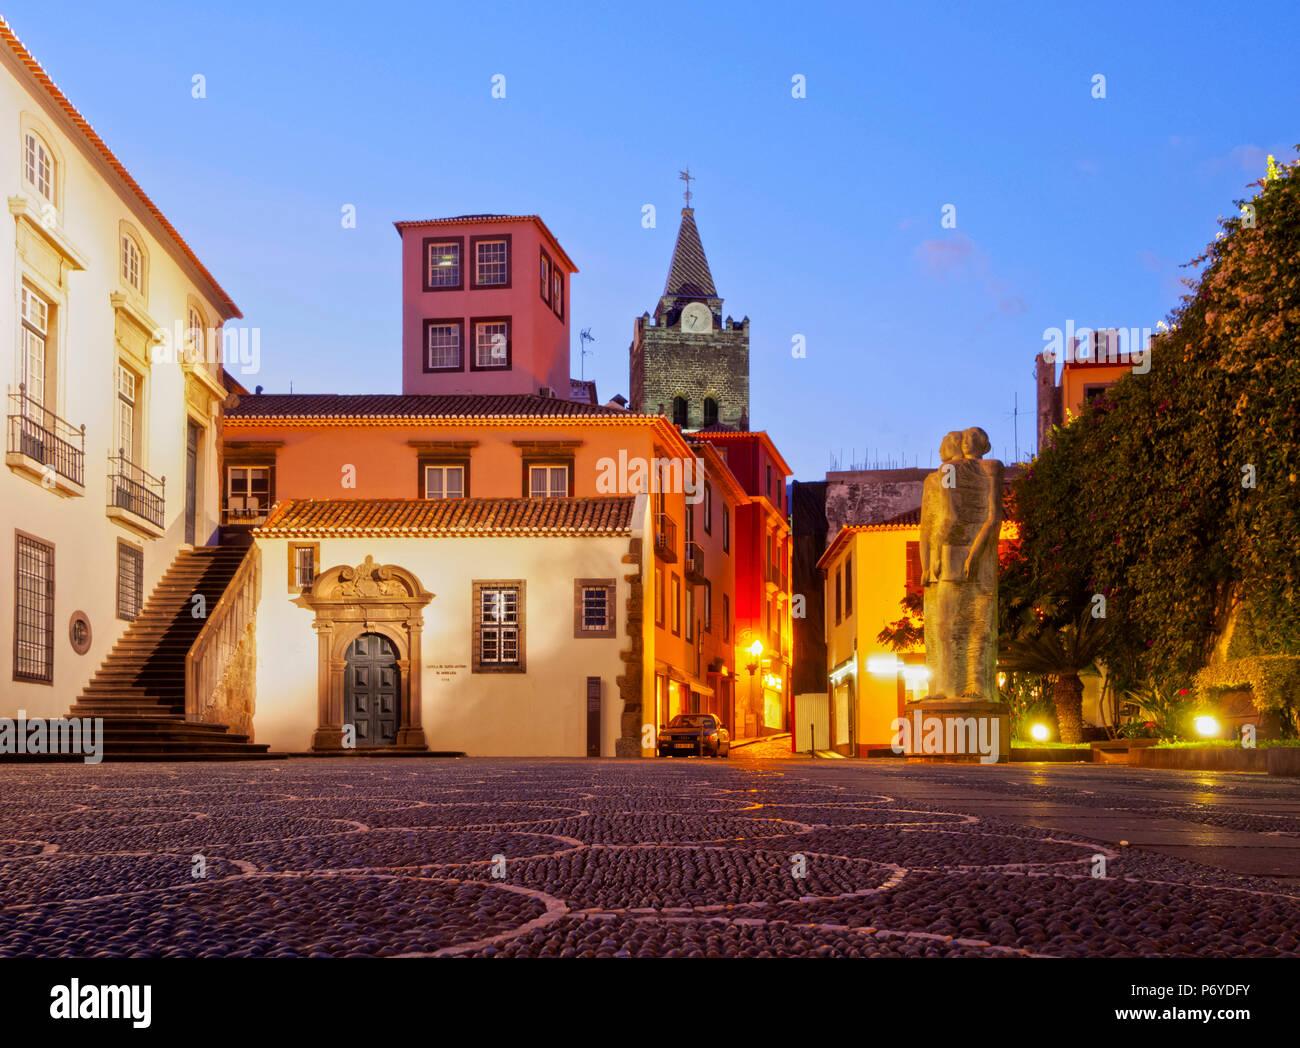 Portugal, Madeira, Funchal, Dämmerung Blick auf die Altstadt. Stockbild